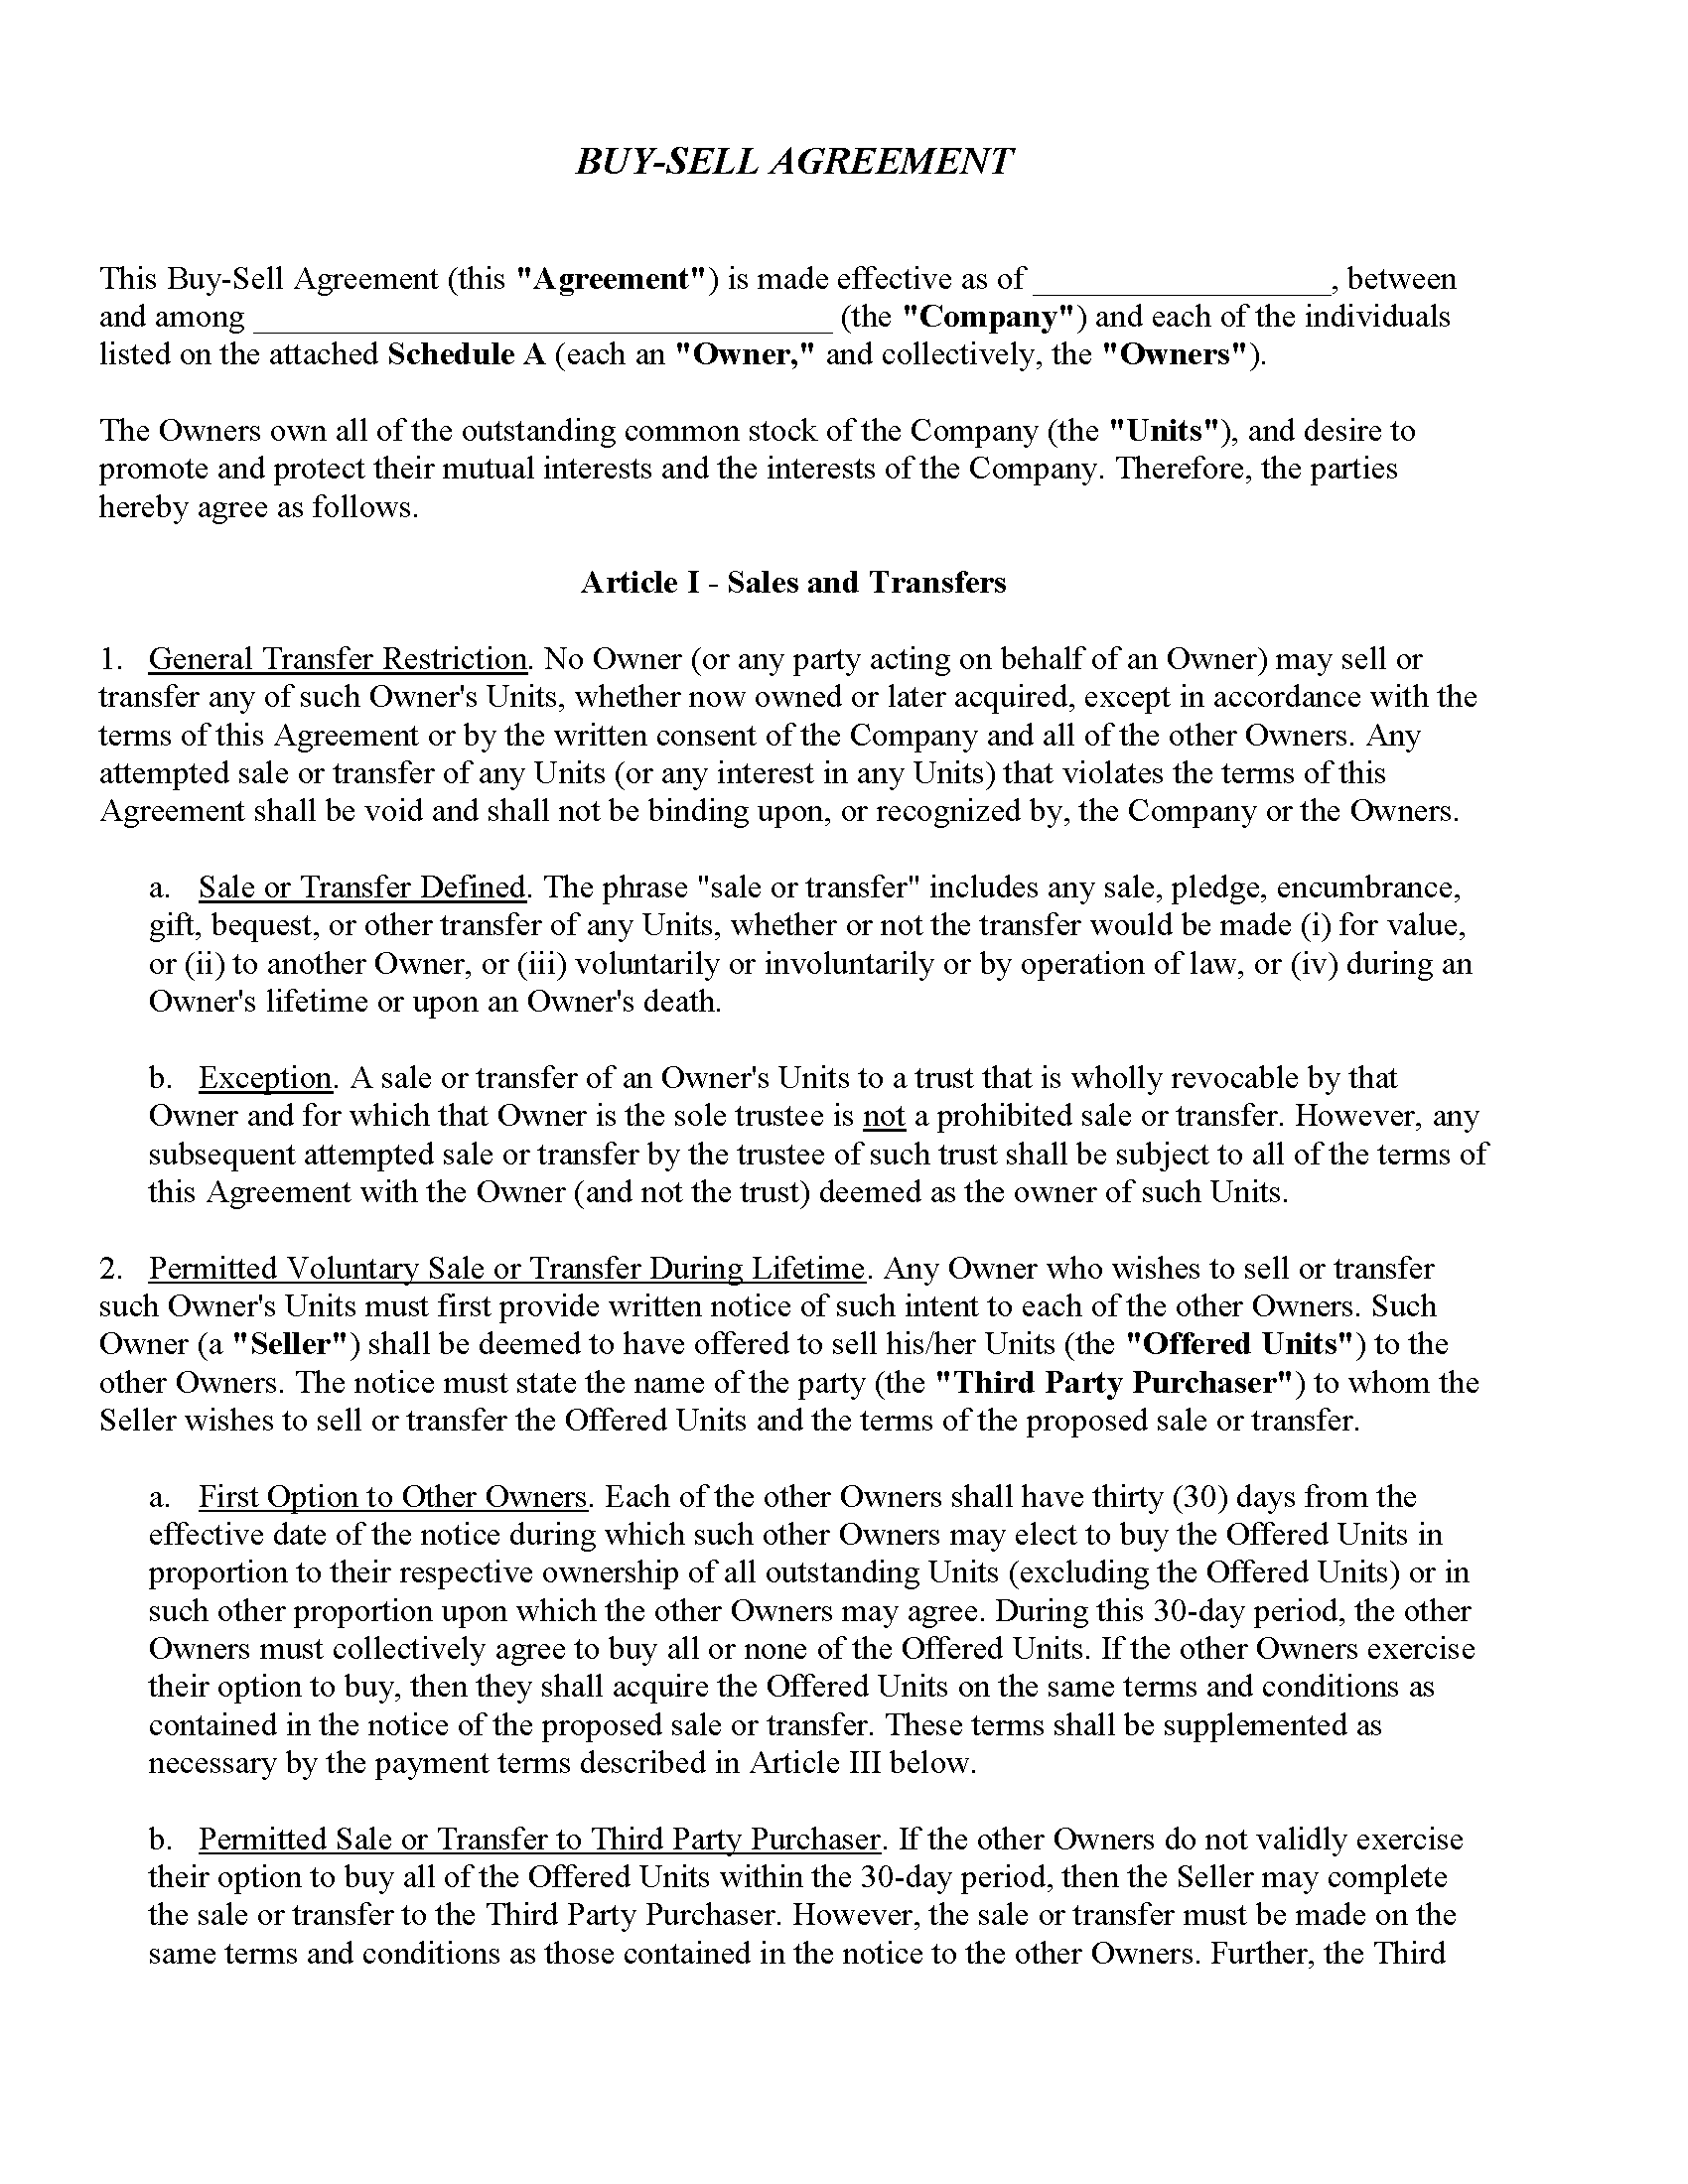 Alaska Buy-Sell Agreement